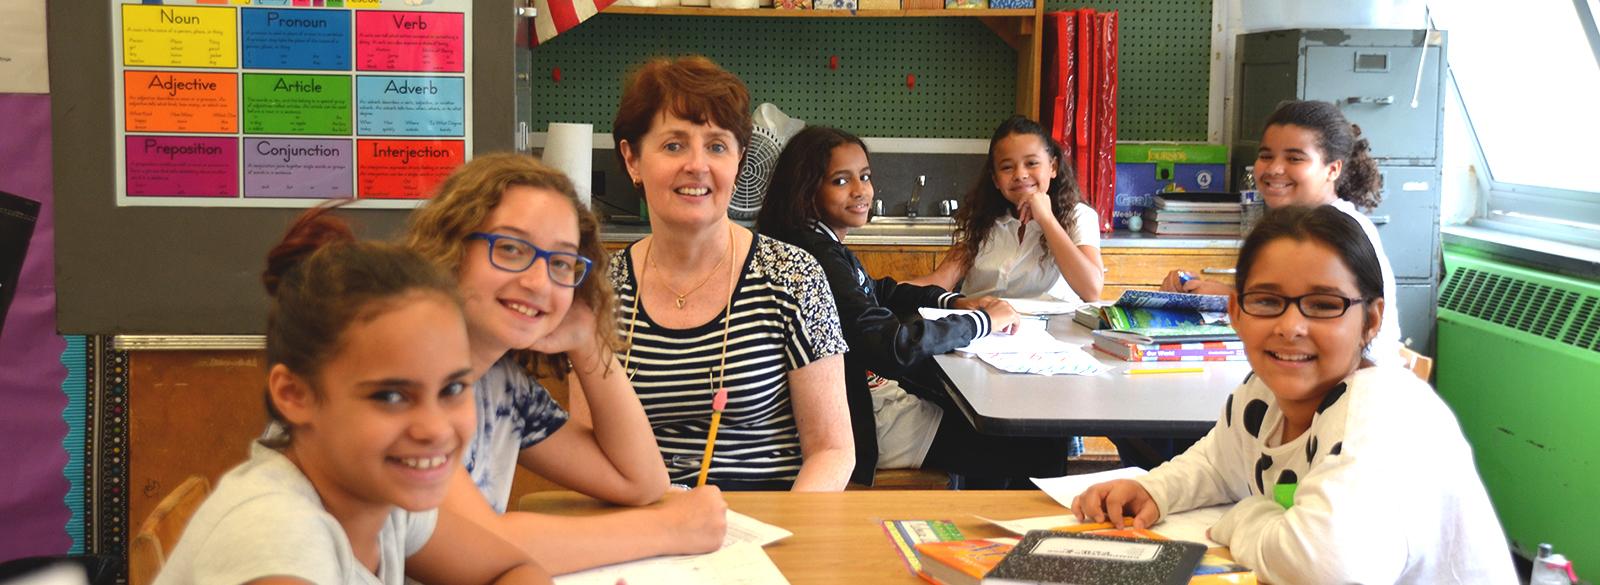 Montessori School 27 Homepage